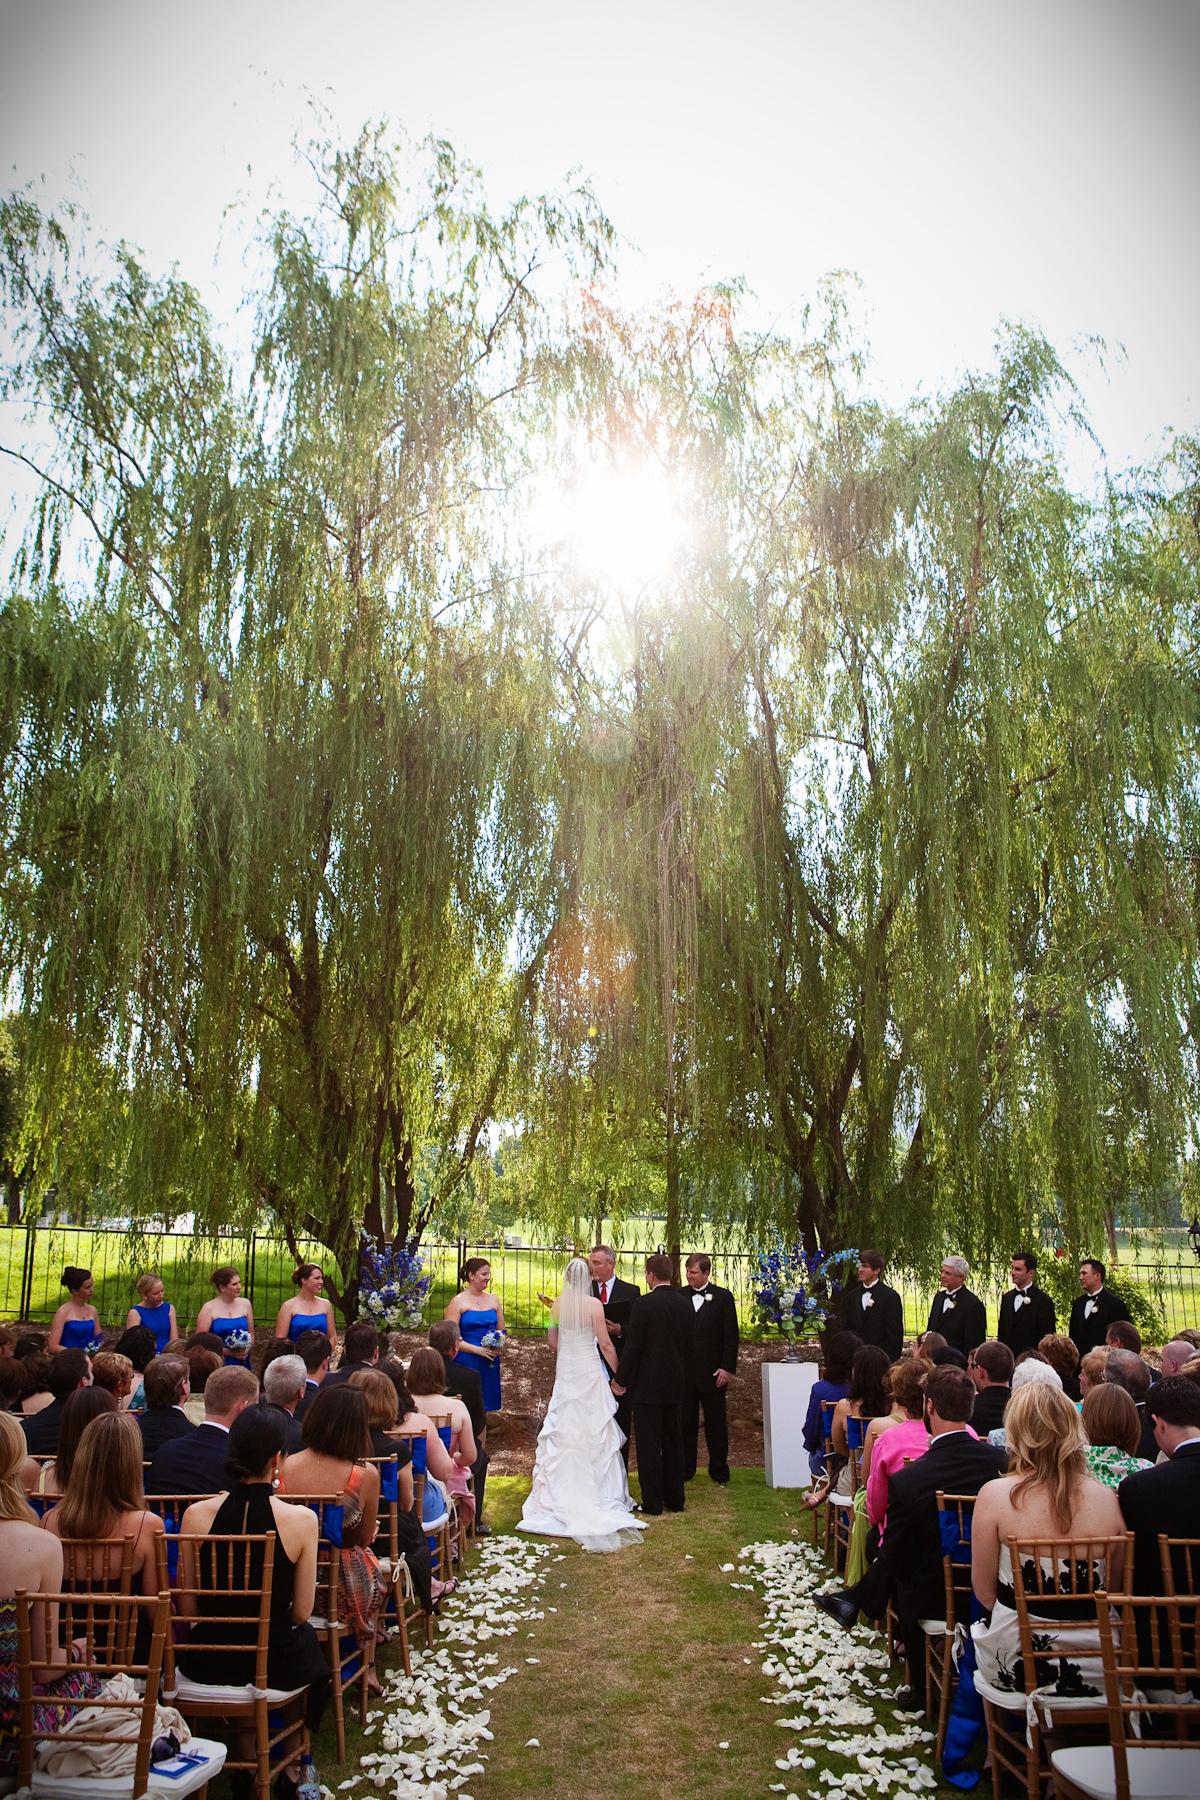 Ceremony, Flowers & Decor, Park, Outside